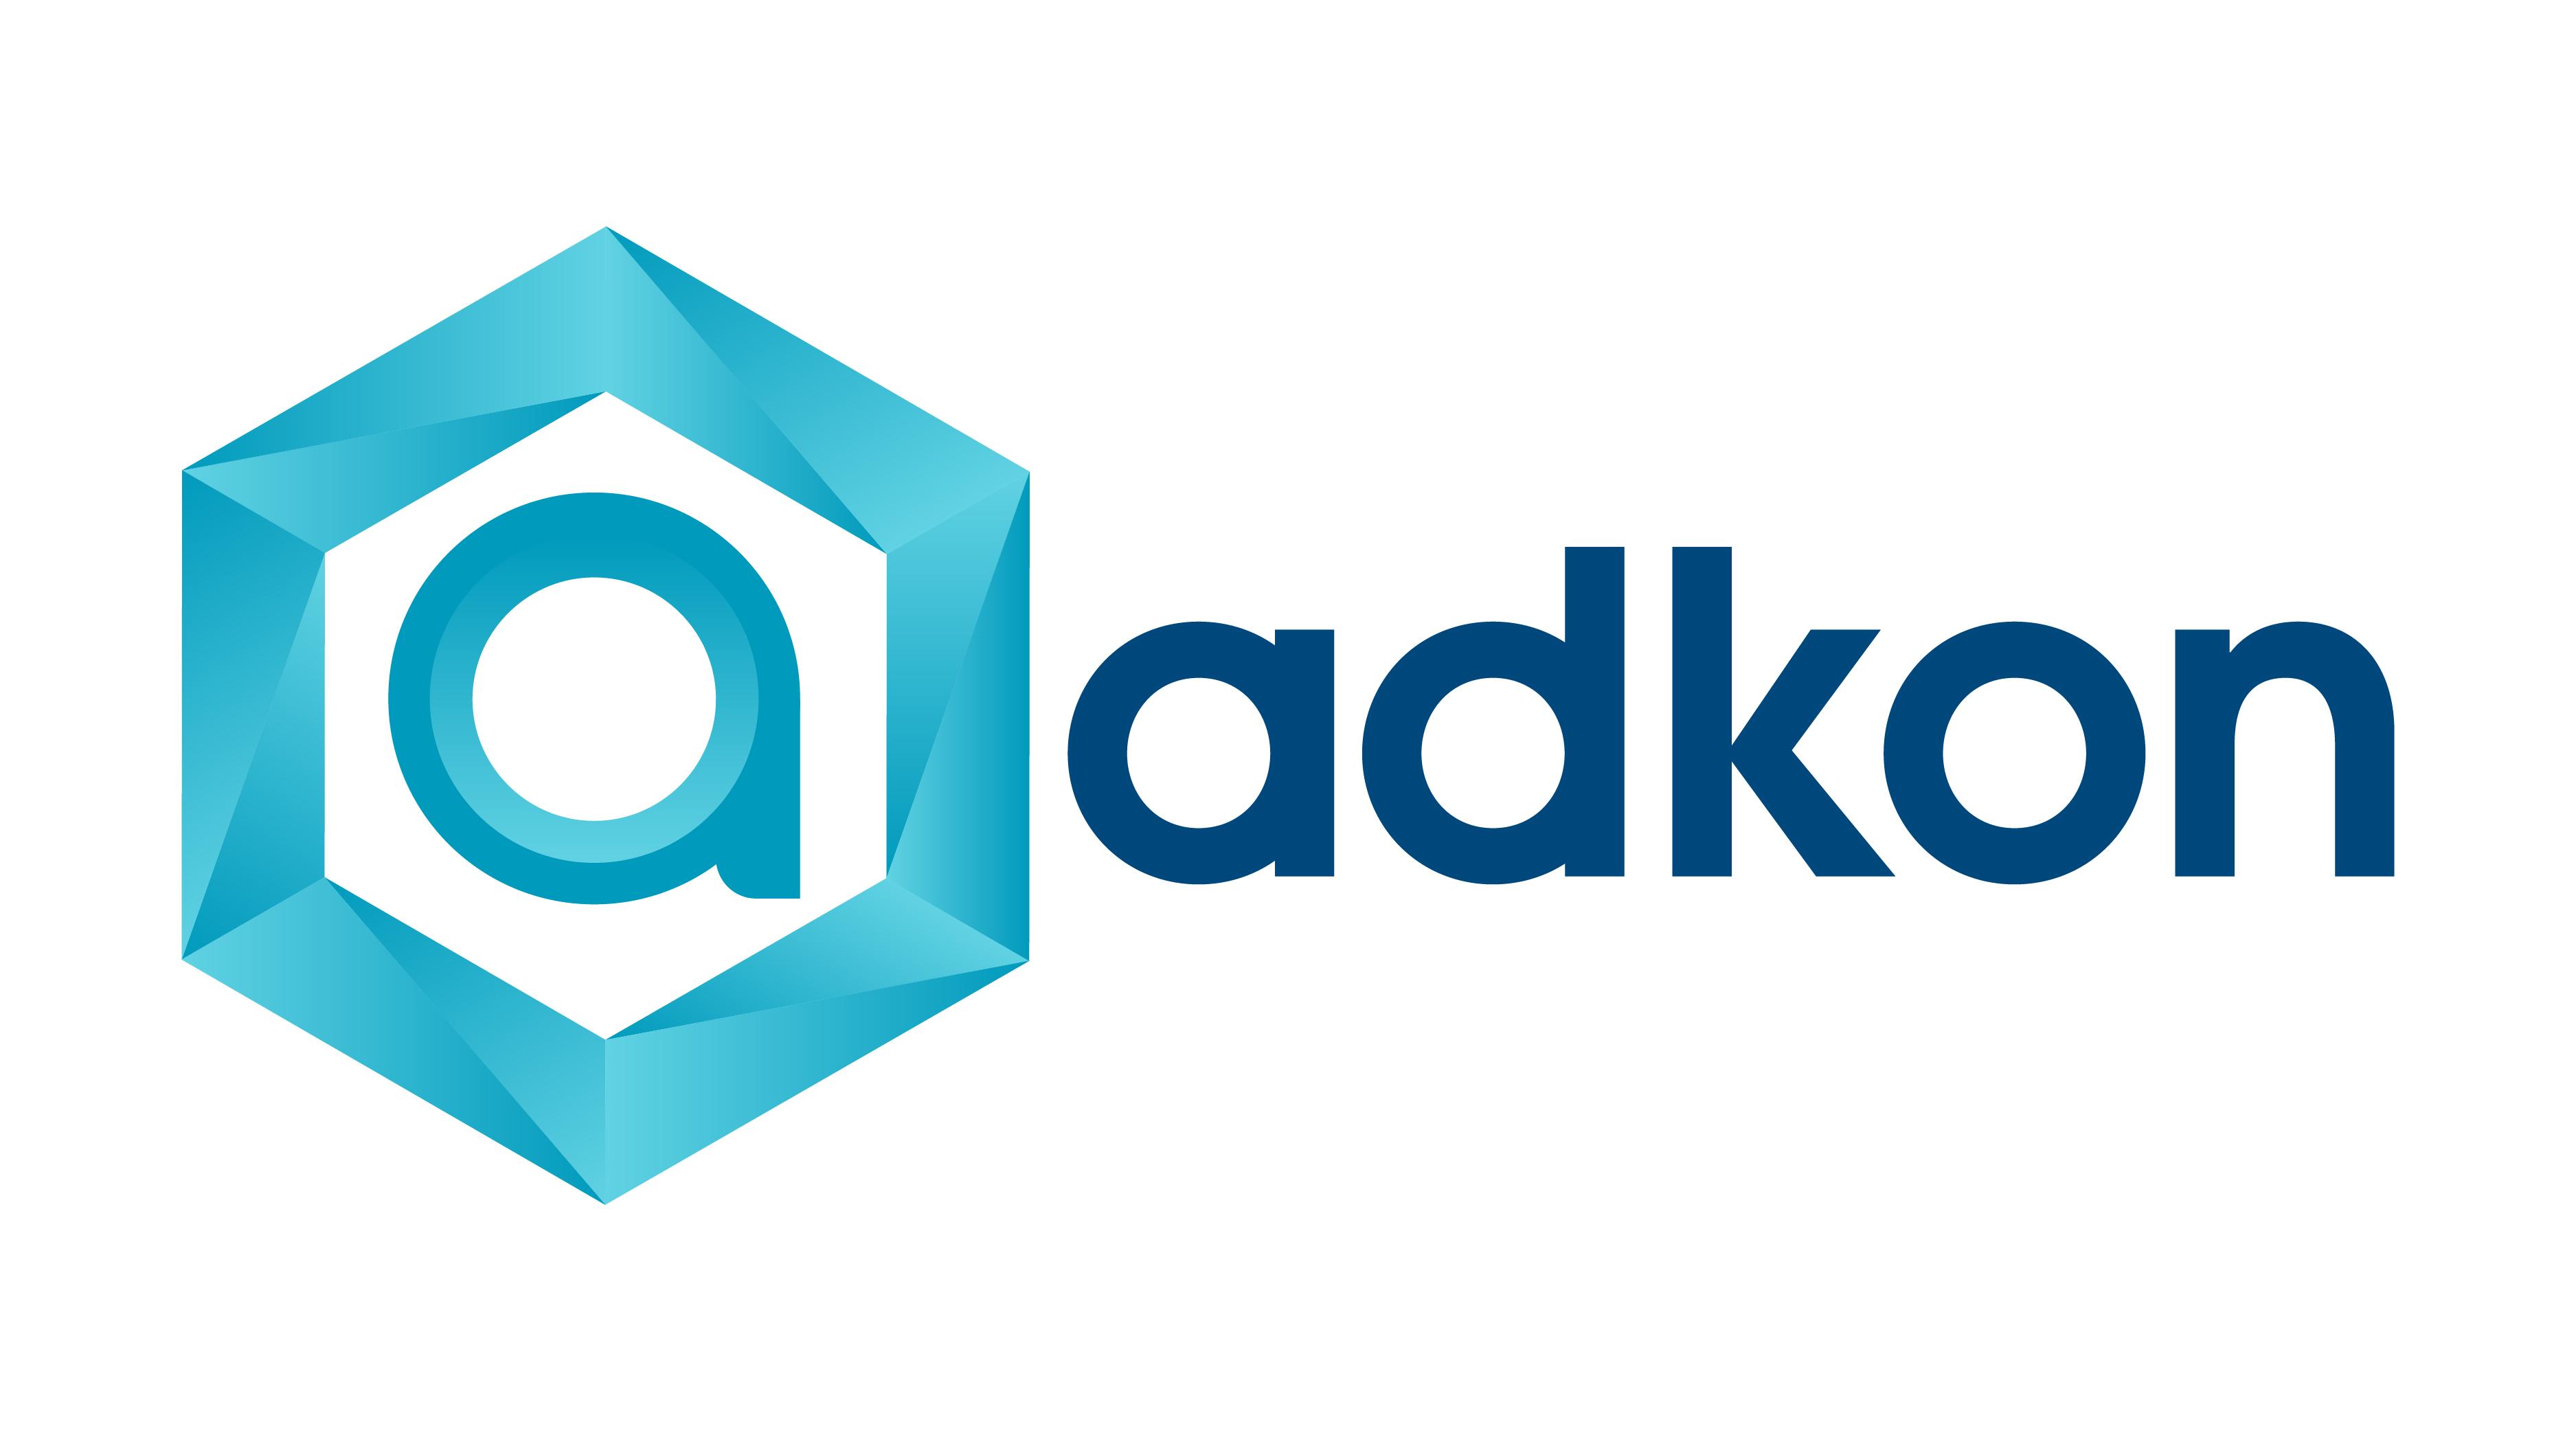 Разработка логотипа для компании фото f_1325967cf97b4082.jpg